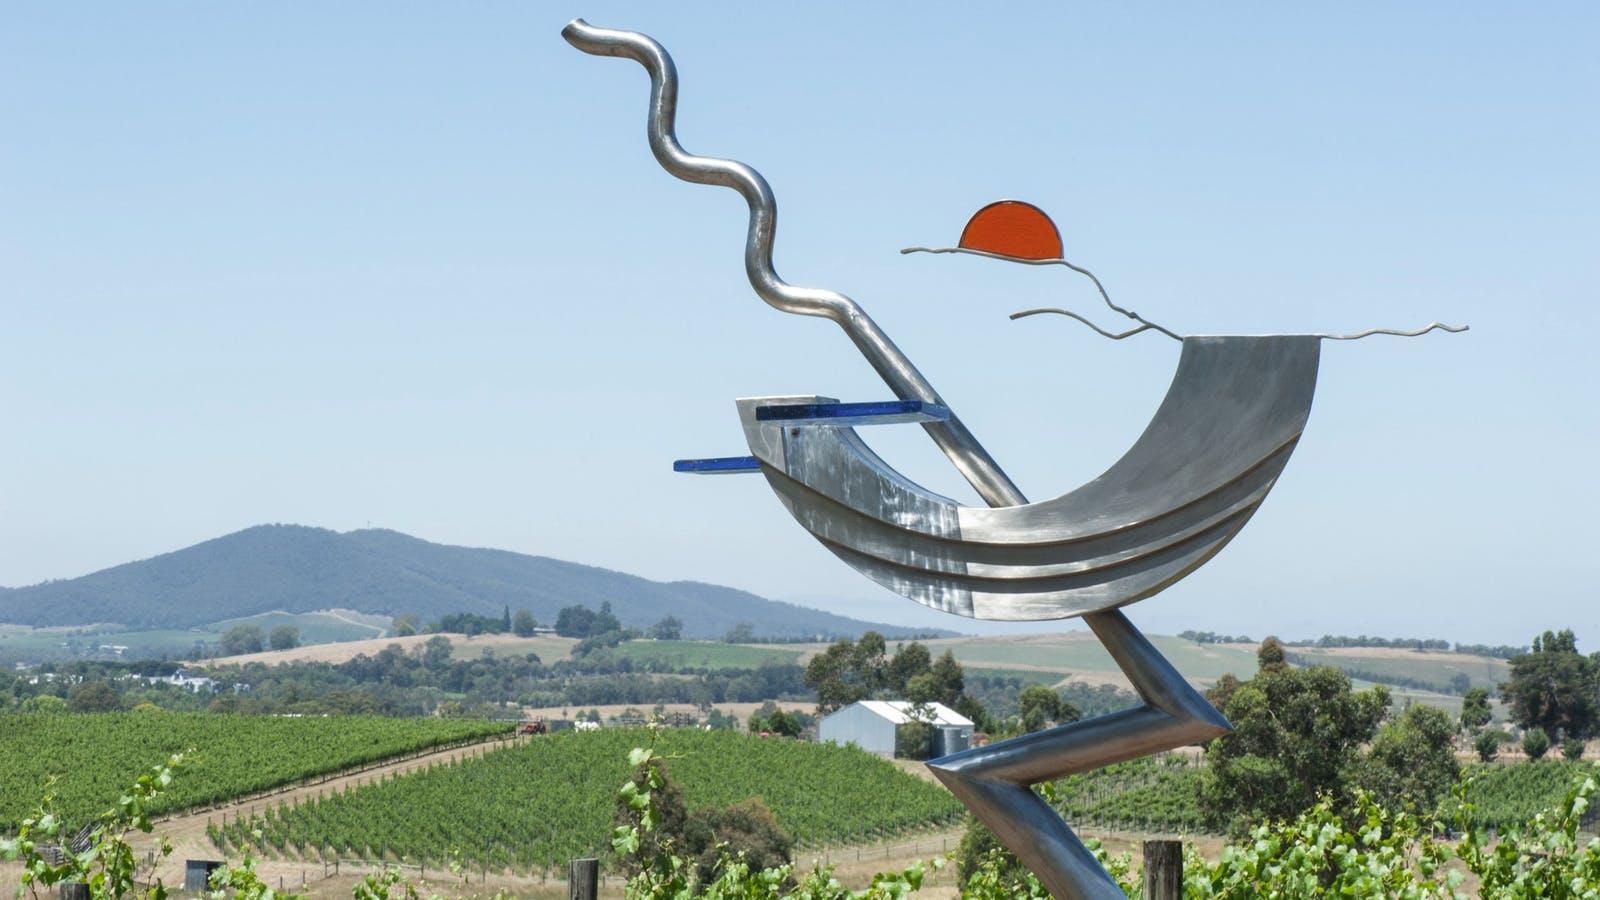 Stainless steel sculptures with vineyard views